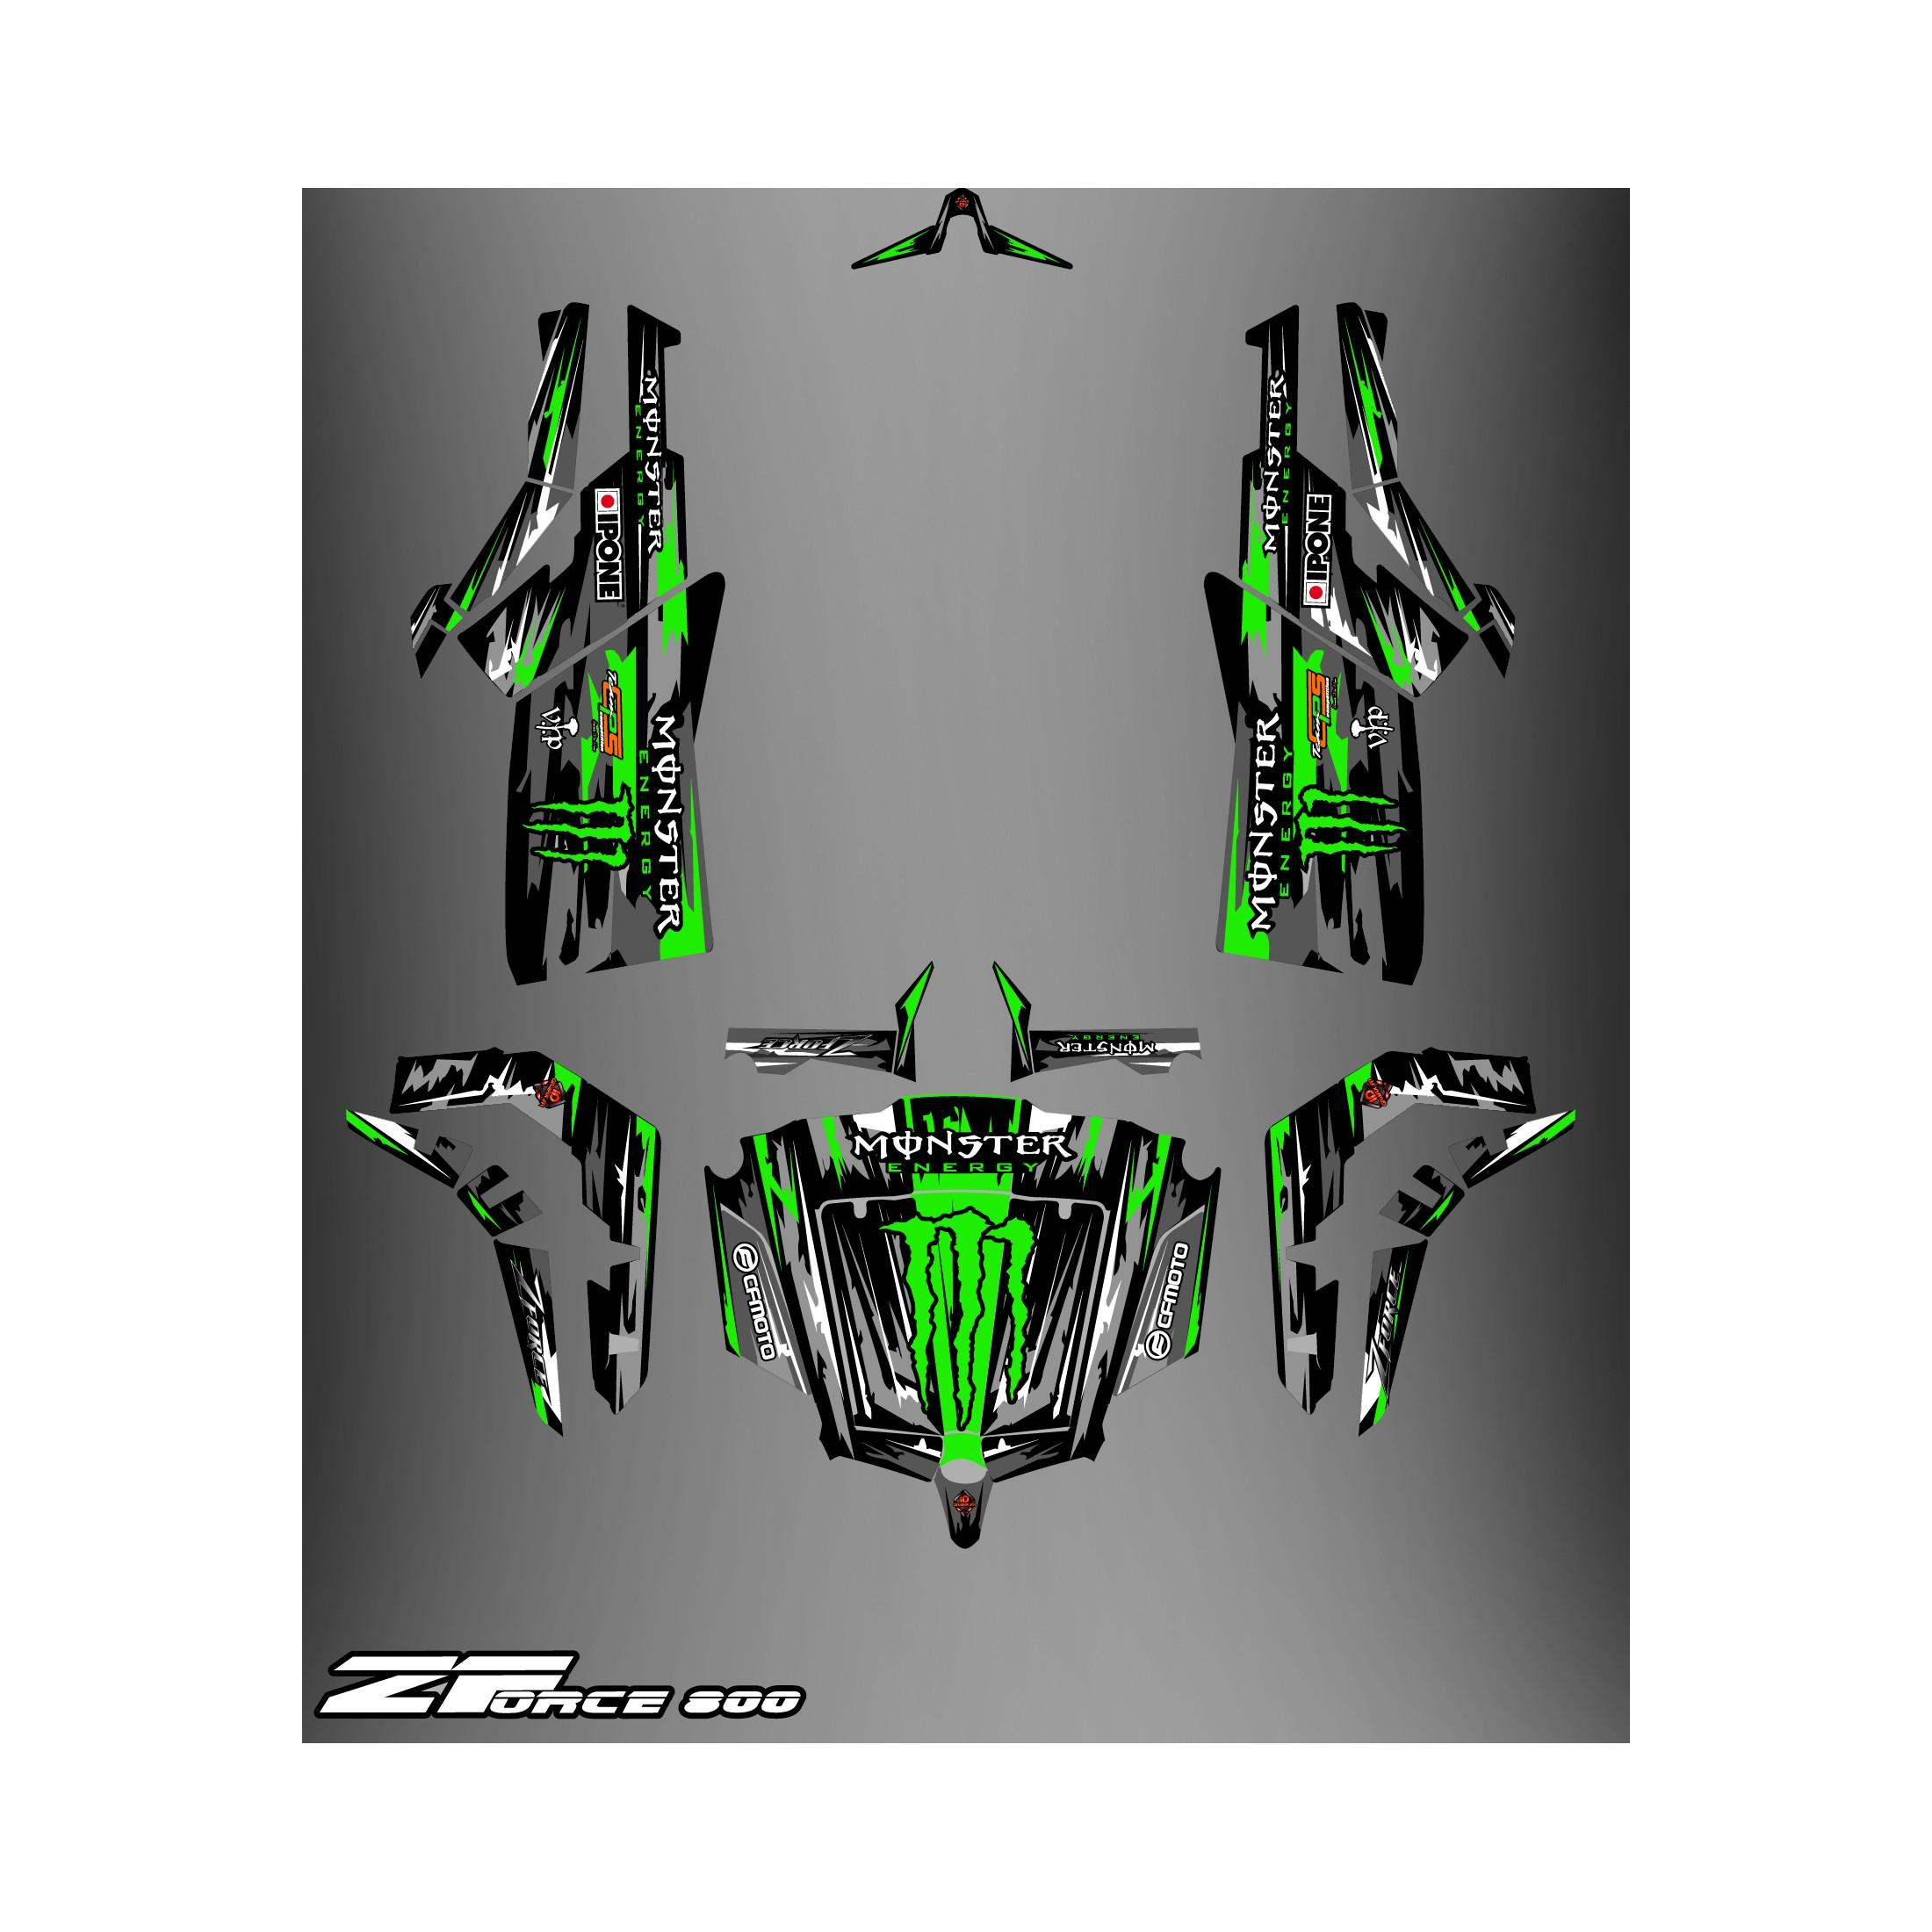 Kit d coration monster edition noir vert idgrafix cf for Porte zforce 800